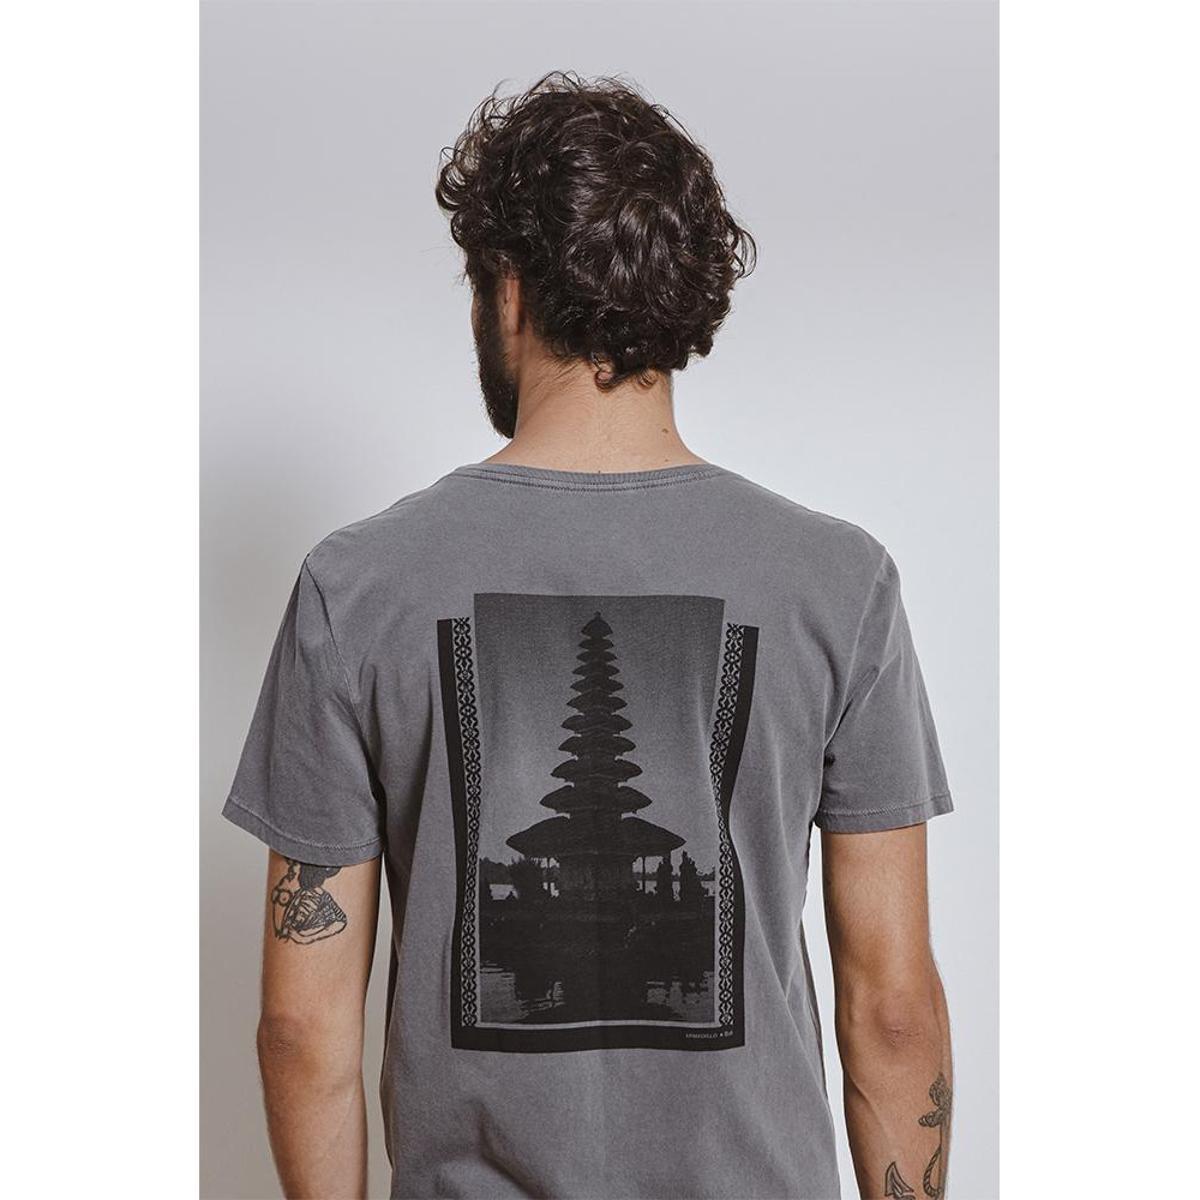 Camiseta Armadillo T-Shirt Bali Hotel Masculina - Chumbo